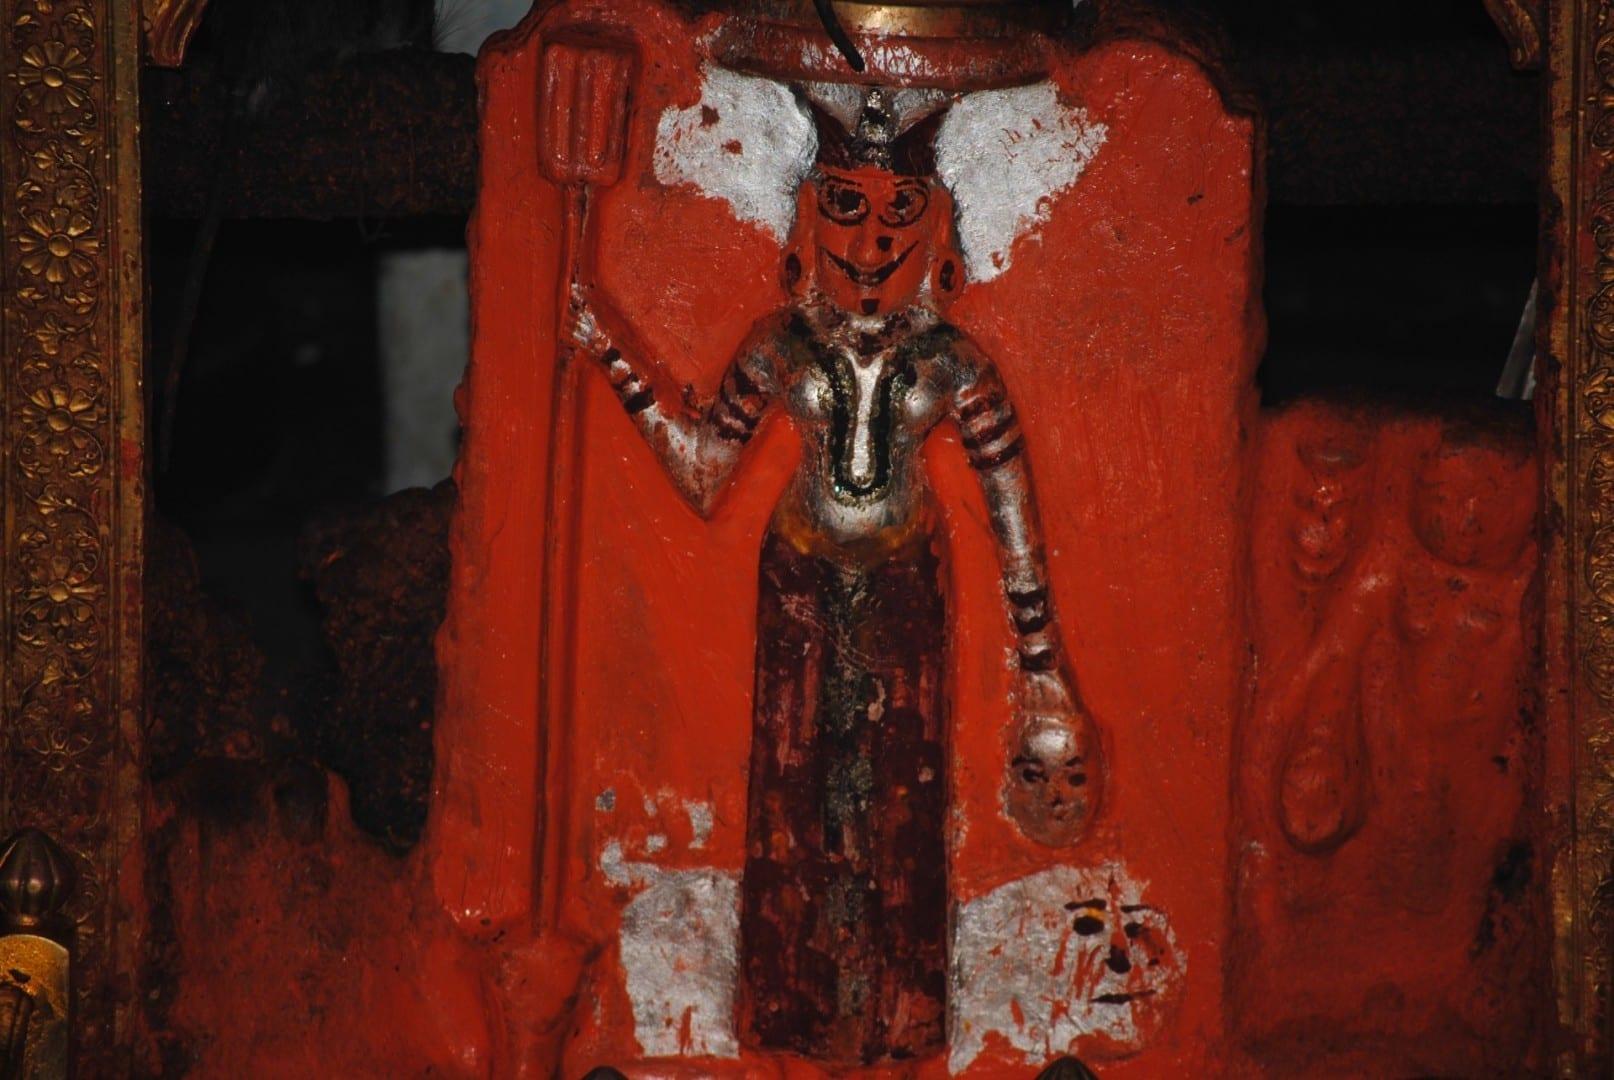 Un ídolo en el Templo Karni Mata Bikaner India